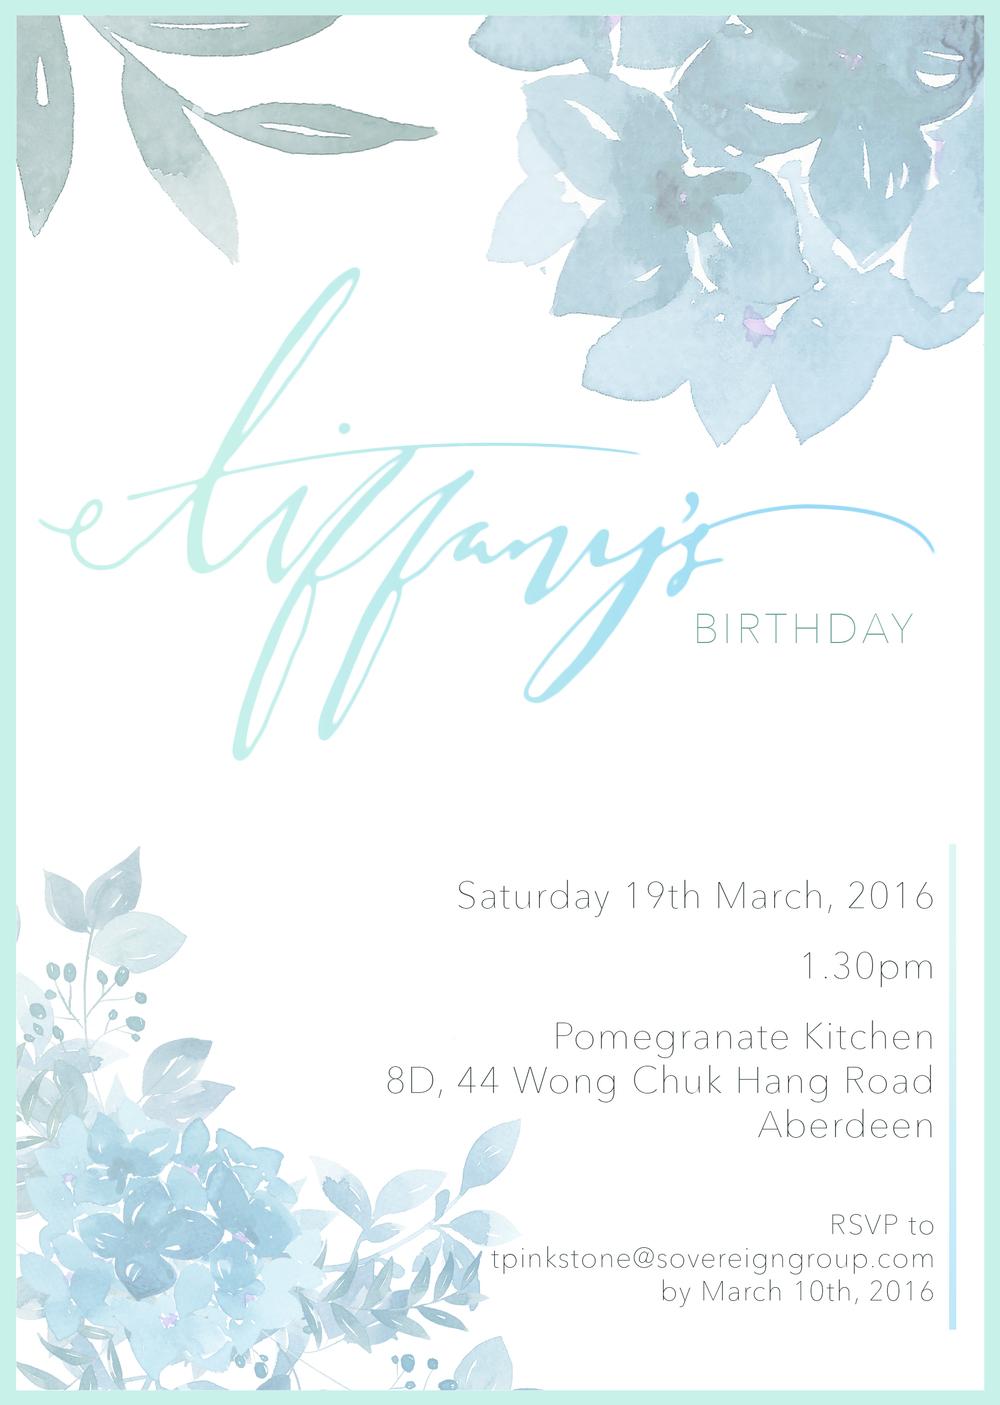 Tiffany Birthday Invitation.jpg